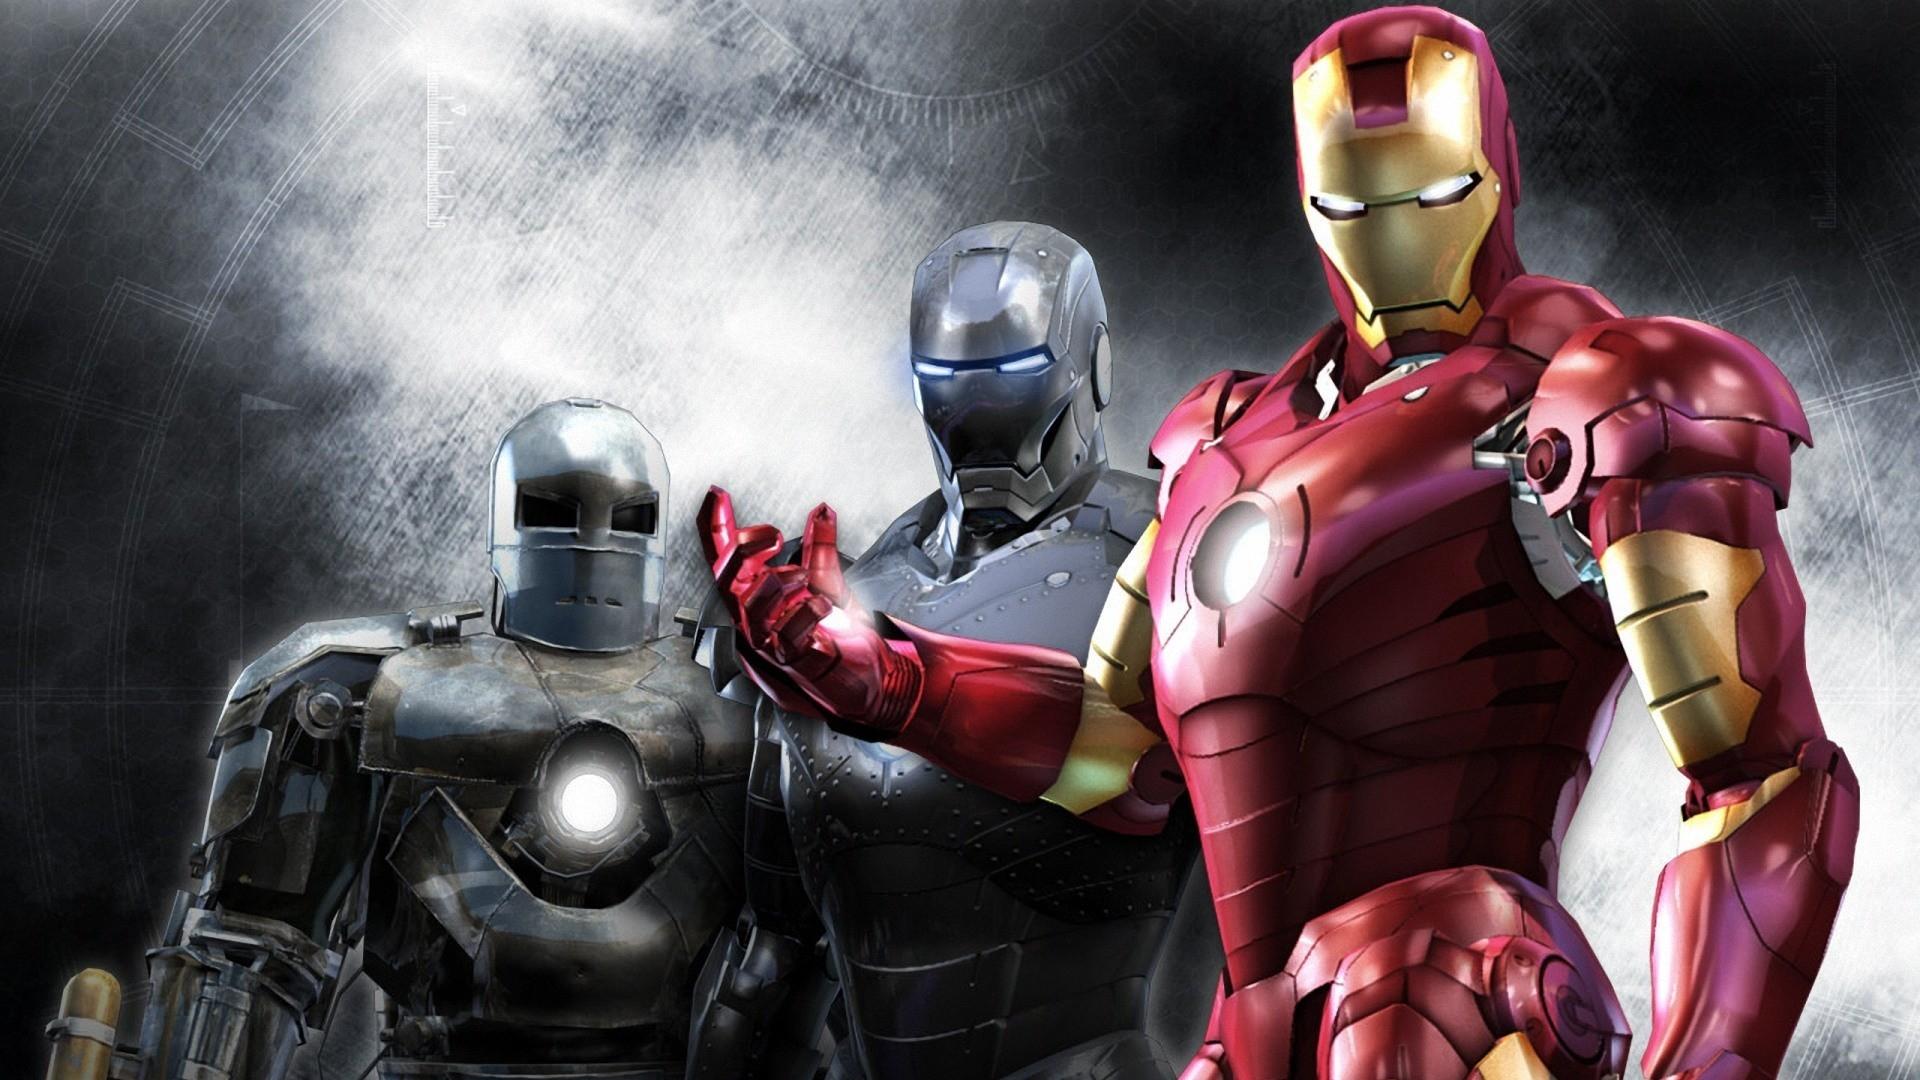 best images about Iron Man on Pinterest Armors Iron man